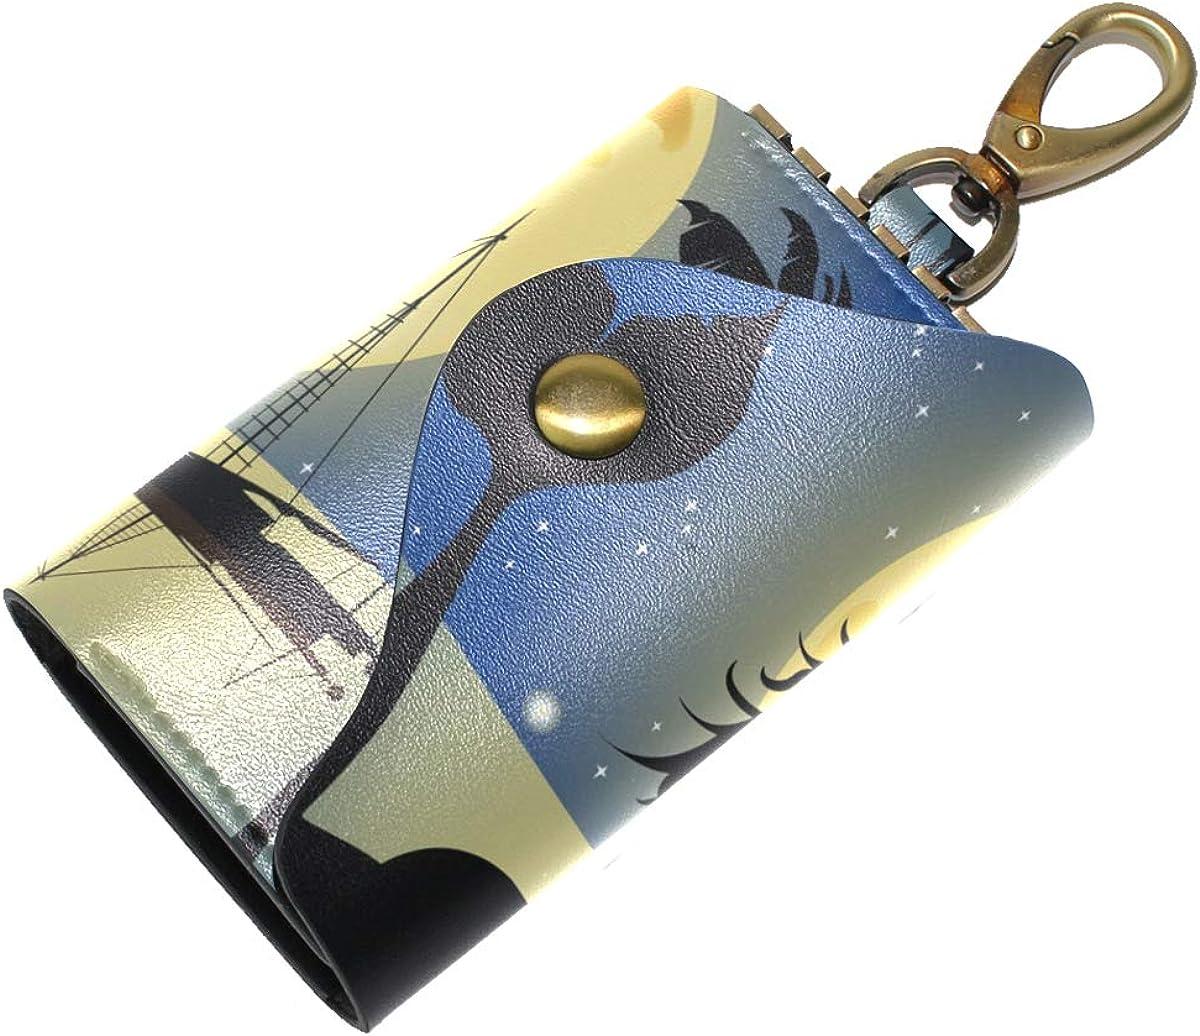 KEAKIA Mermaid Silhouette Leather Key Case Wallets Tri-fold Key Holder Keychains with 6 Hooks 2 Slot Snap Closure for Men Women